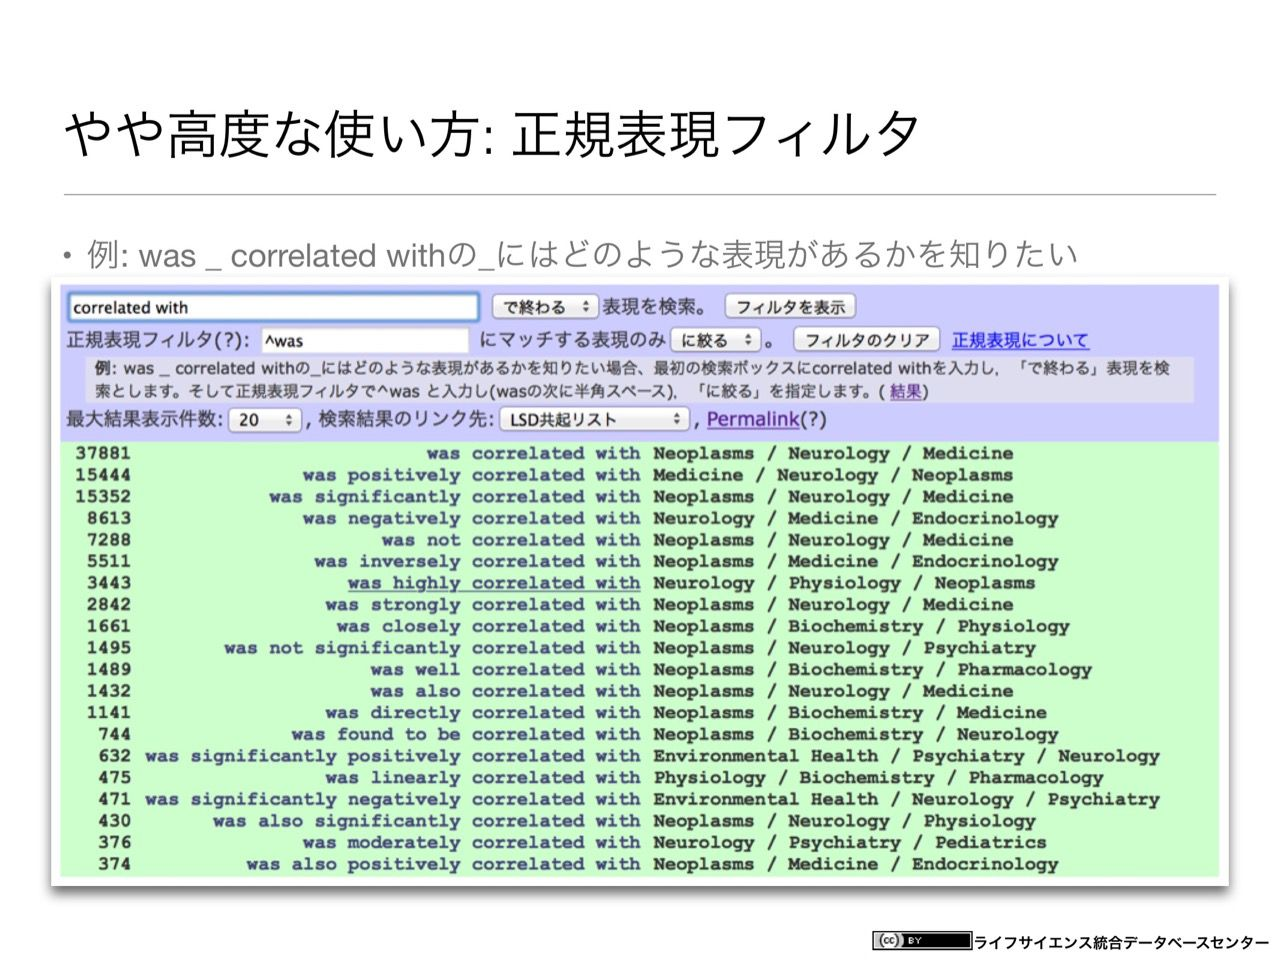 images/AJACS60_yamamoto_053.jpg